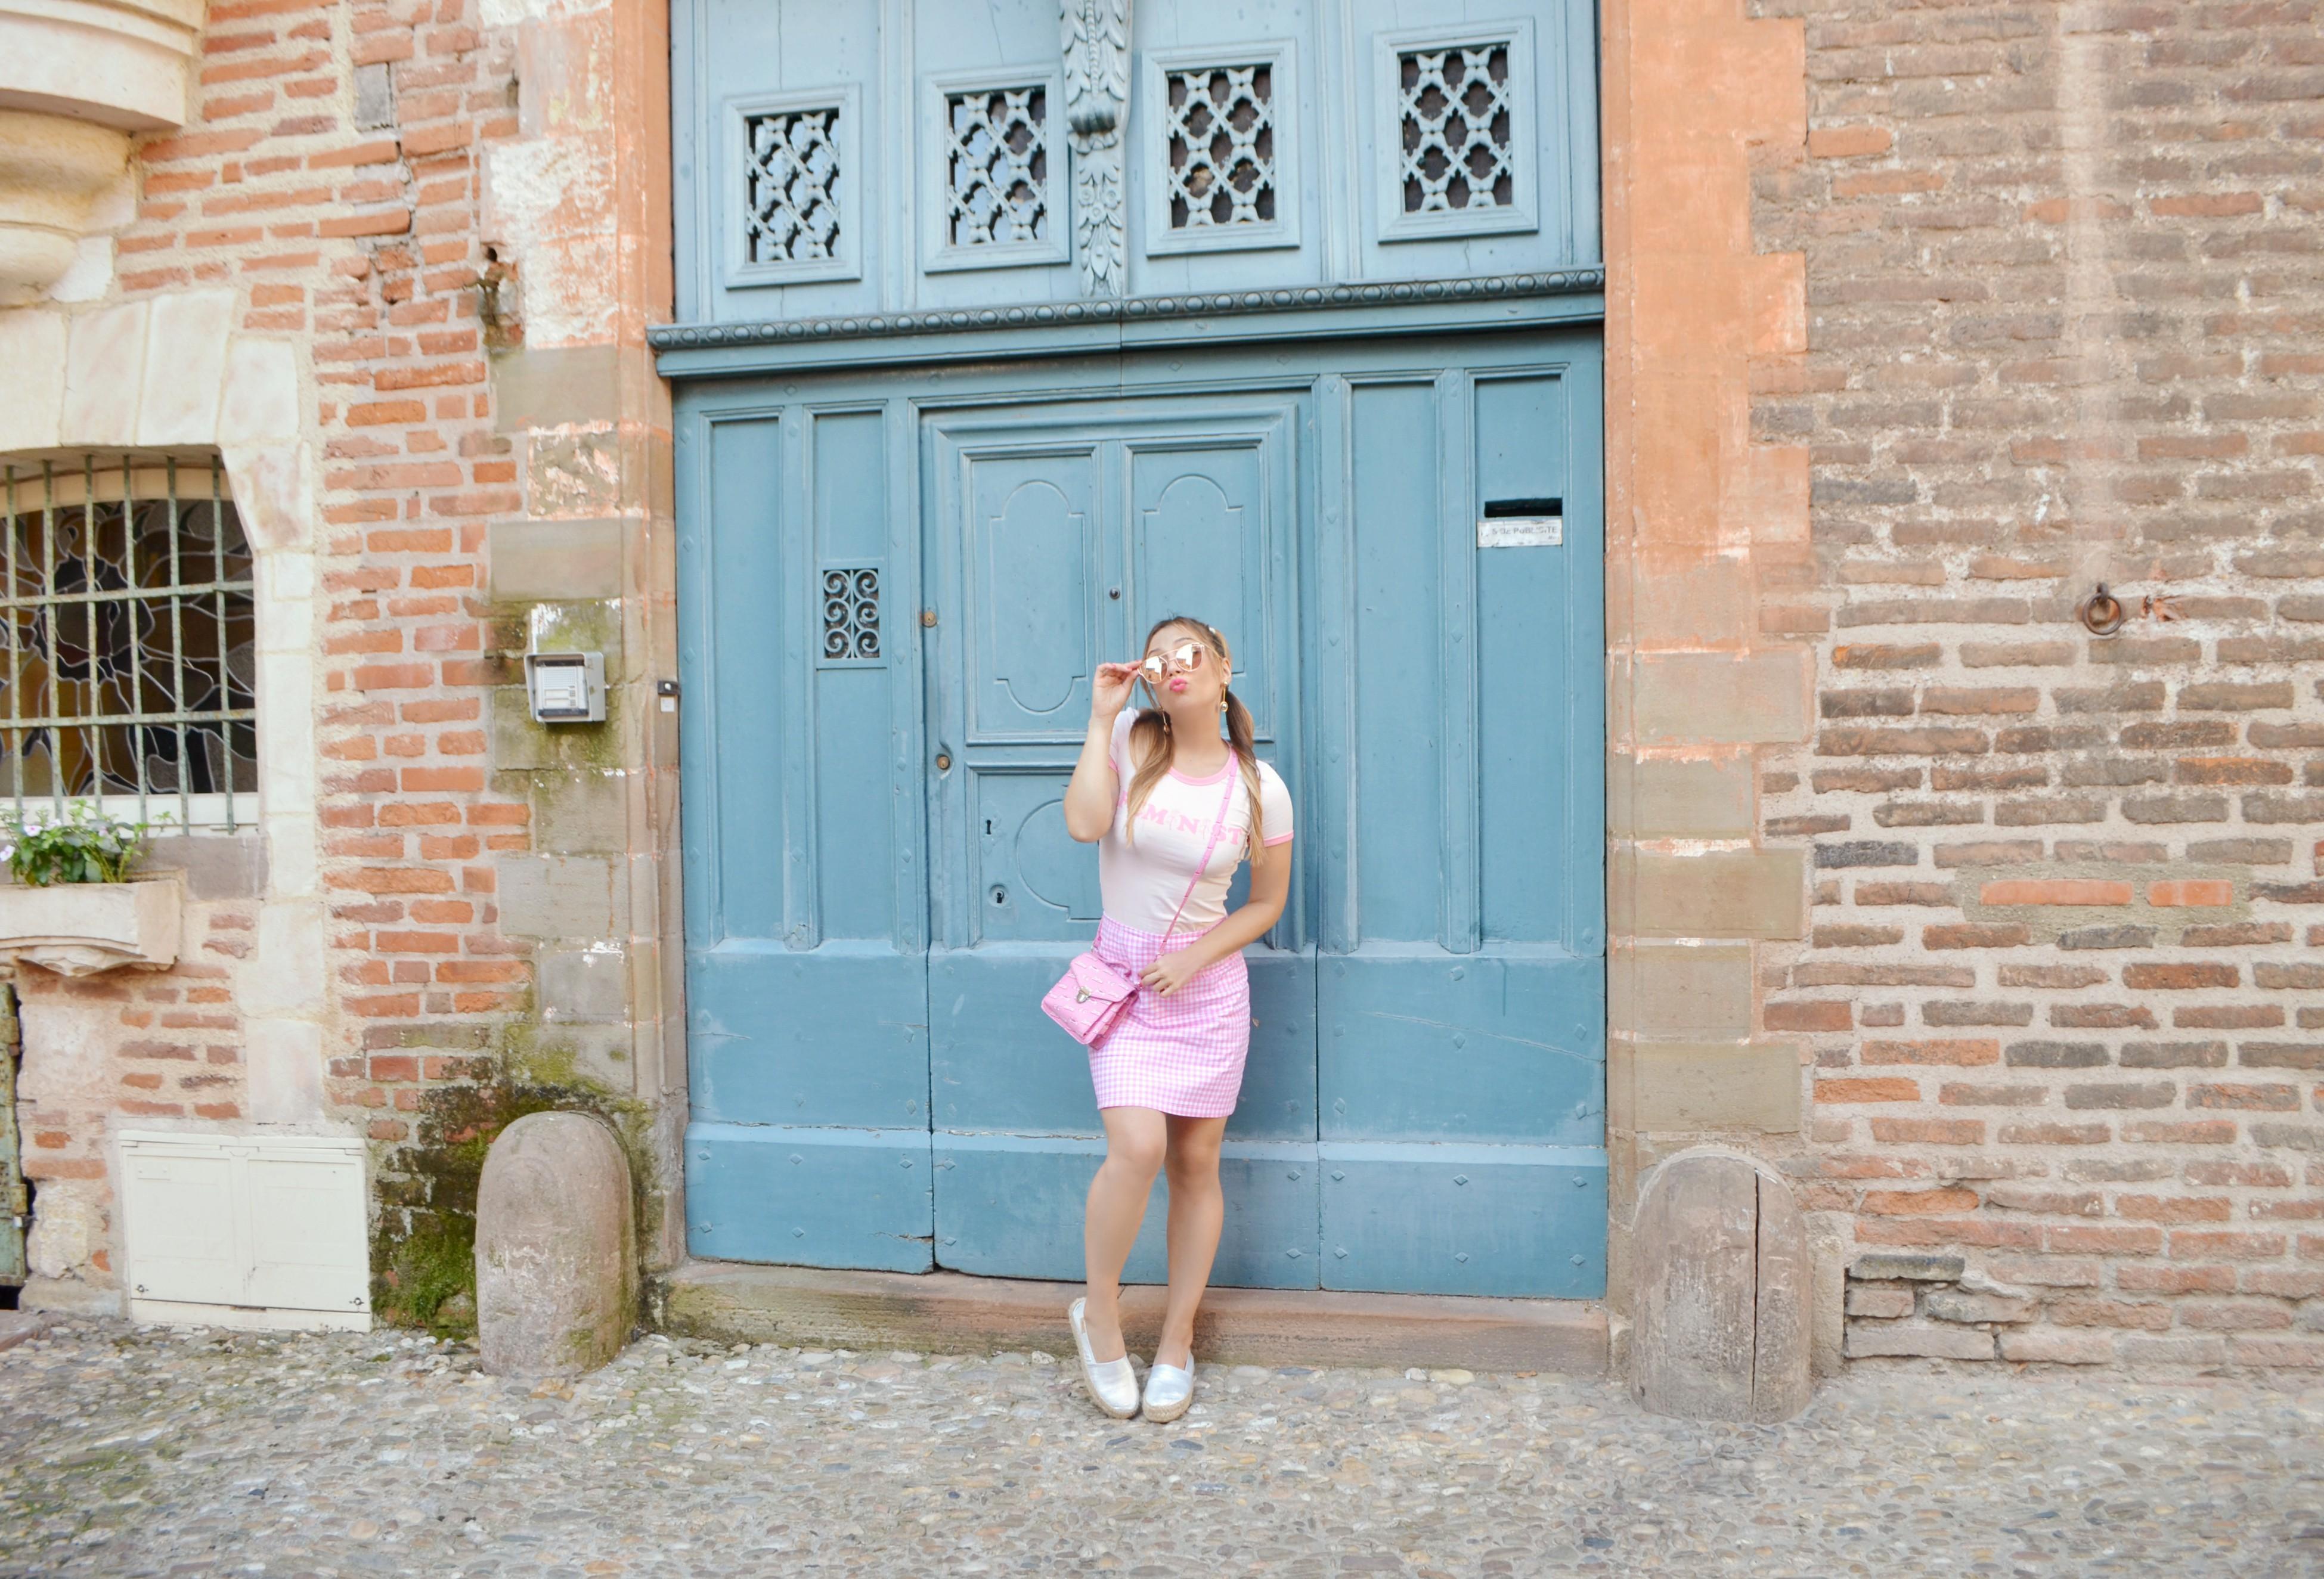 ChicAdicta-blog-de-moda-influencer-vichy-style-Chic-Adicta-fashion-travel-espadrilles-busonier-bolso-Barbie-PiensaenChic-Piensa-en-Chic